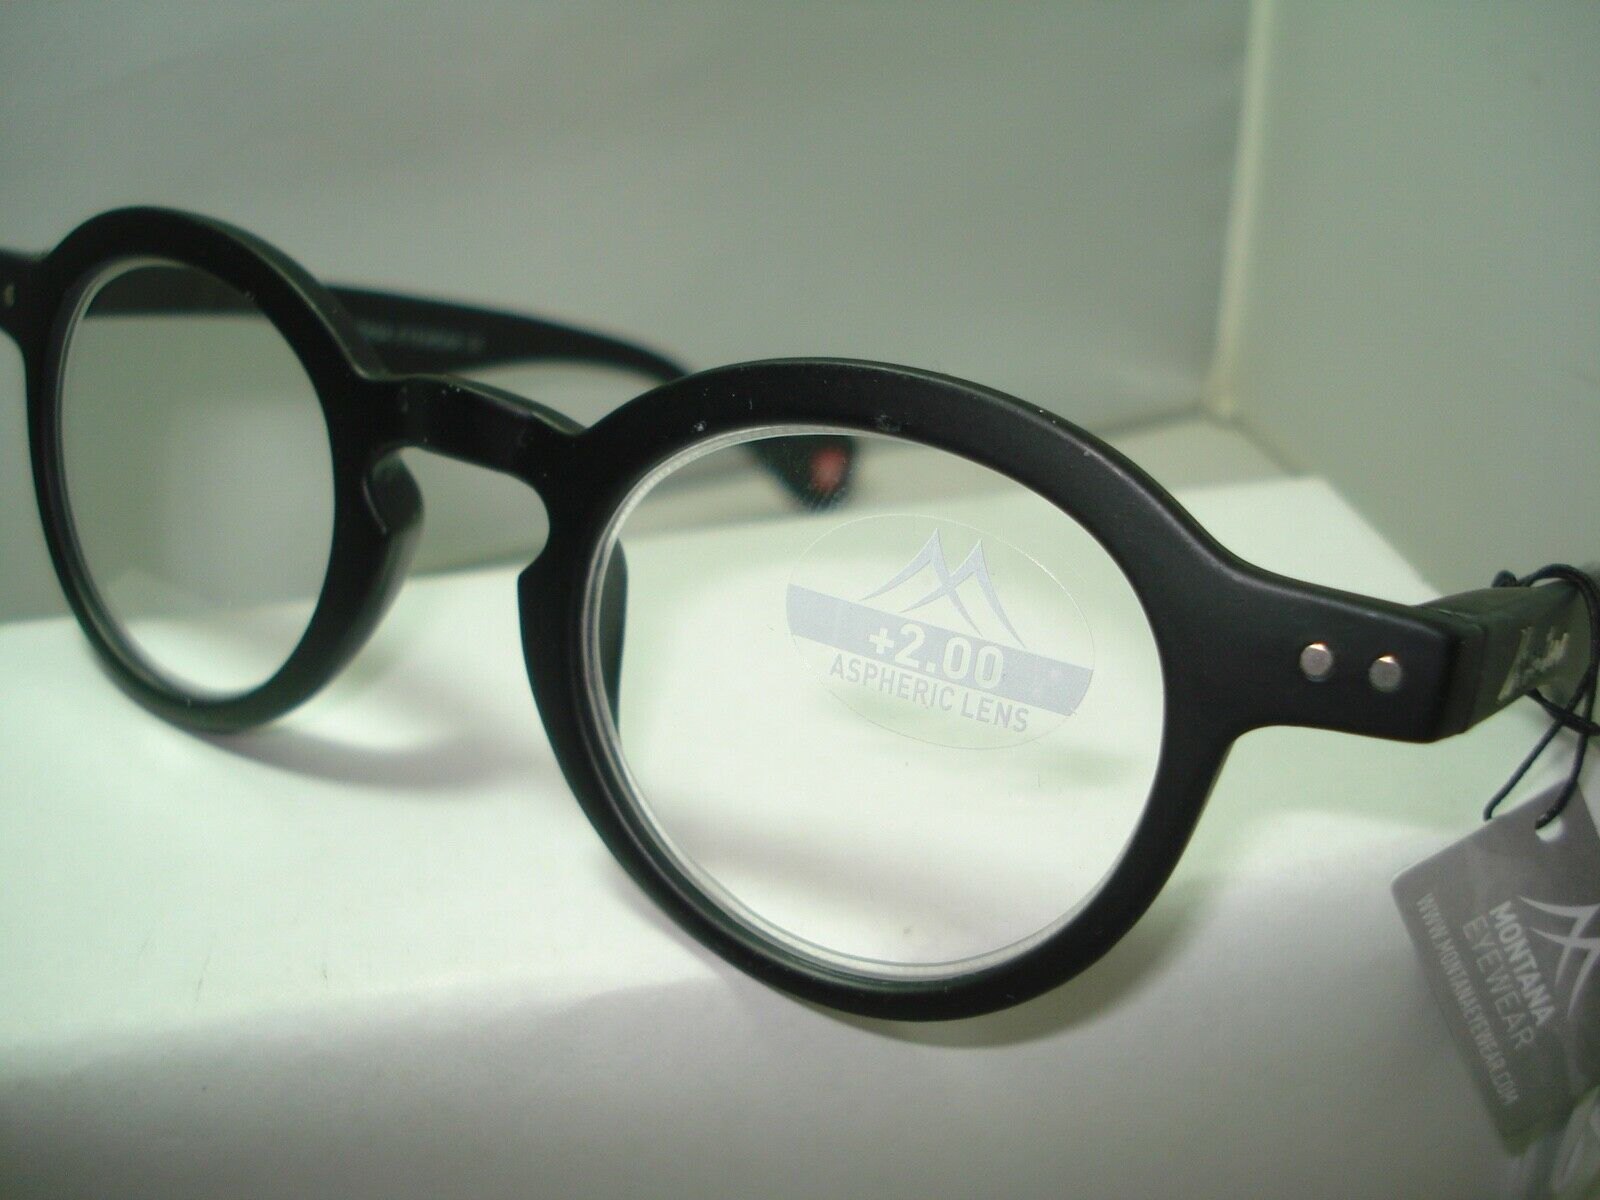 Siskiyou NCAA Unisex Reading Glasses 1.50